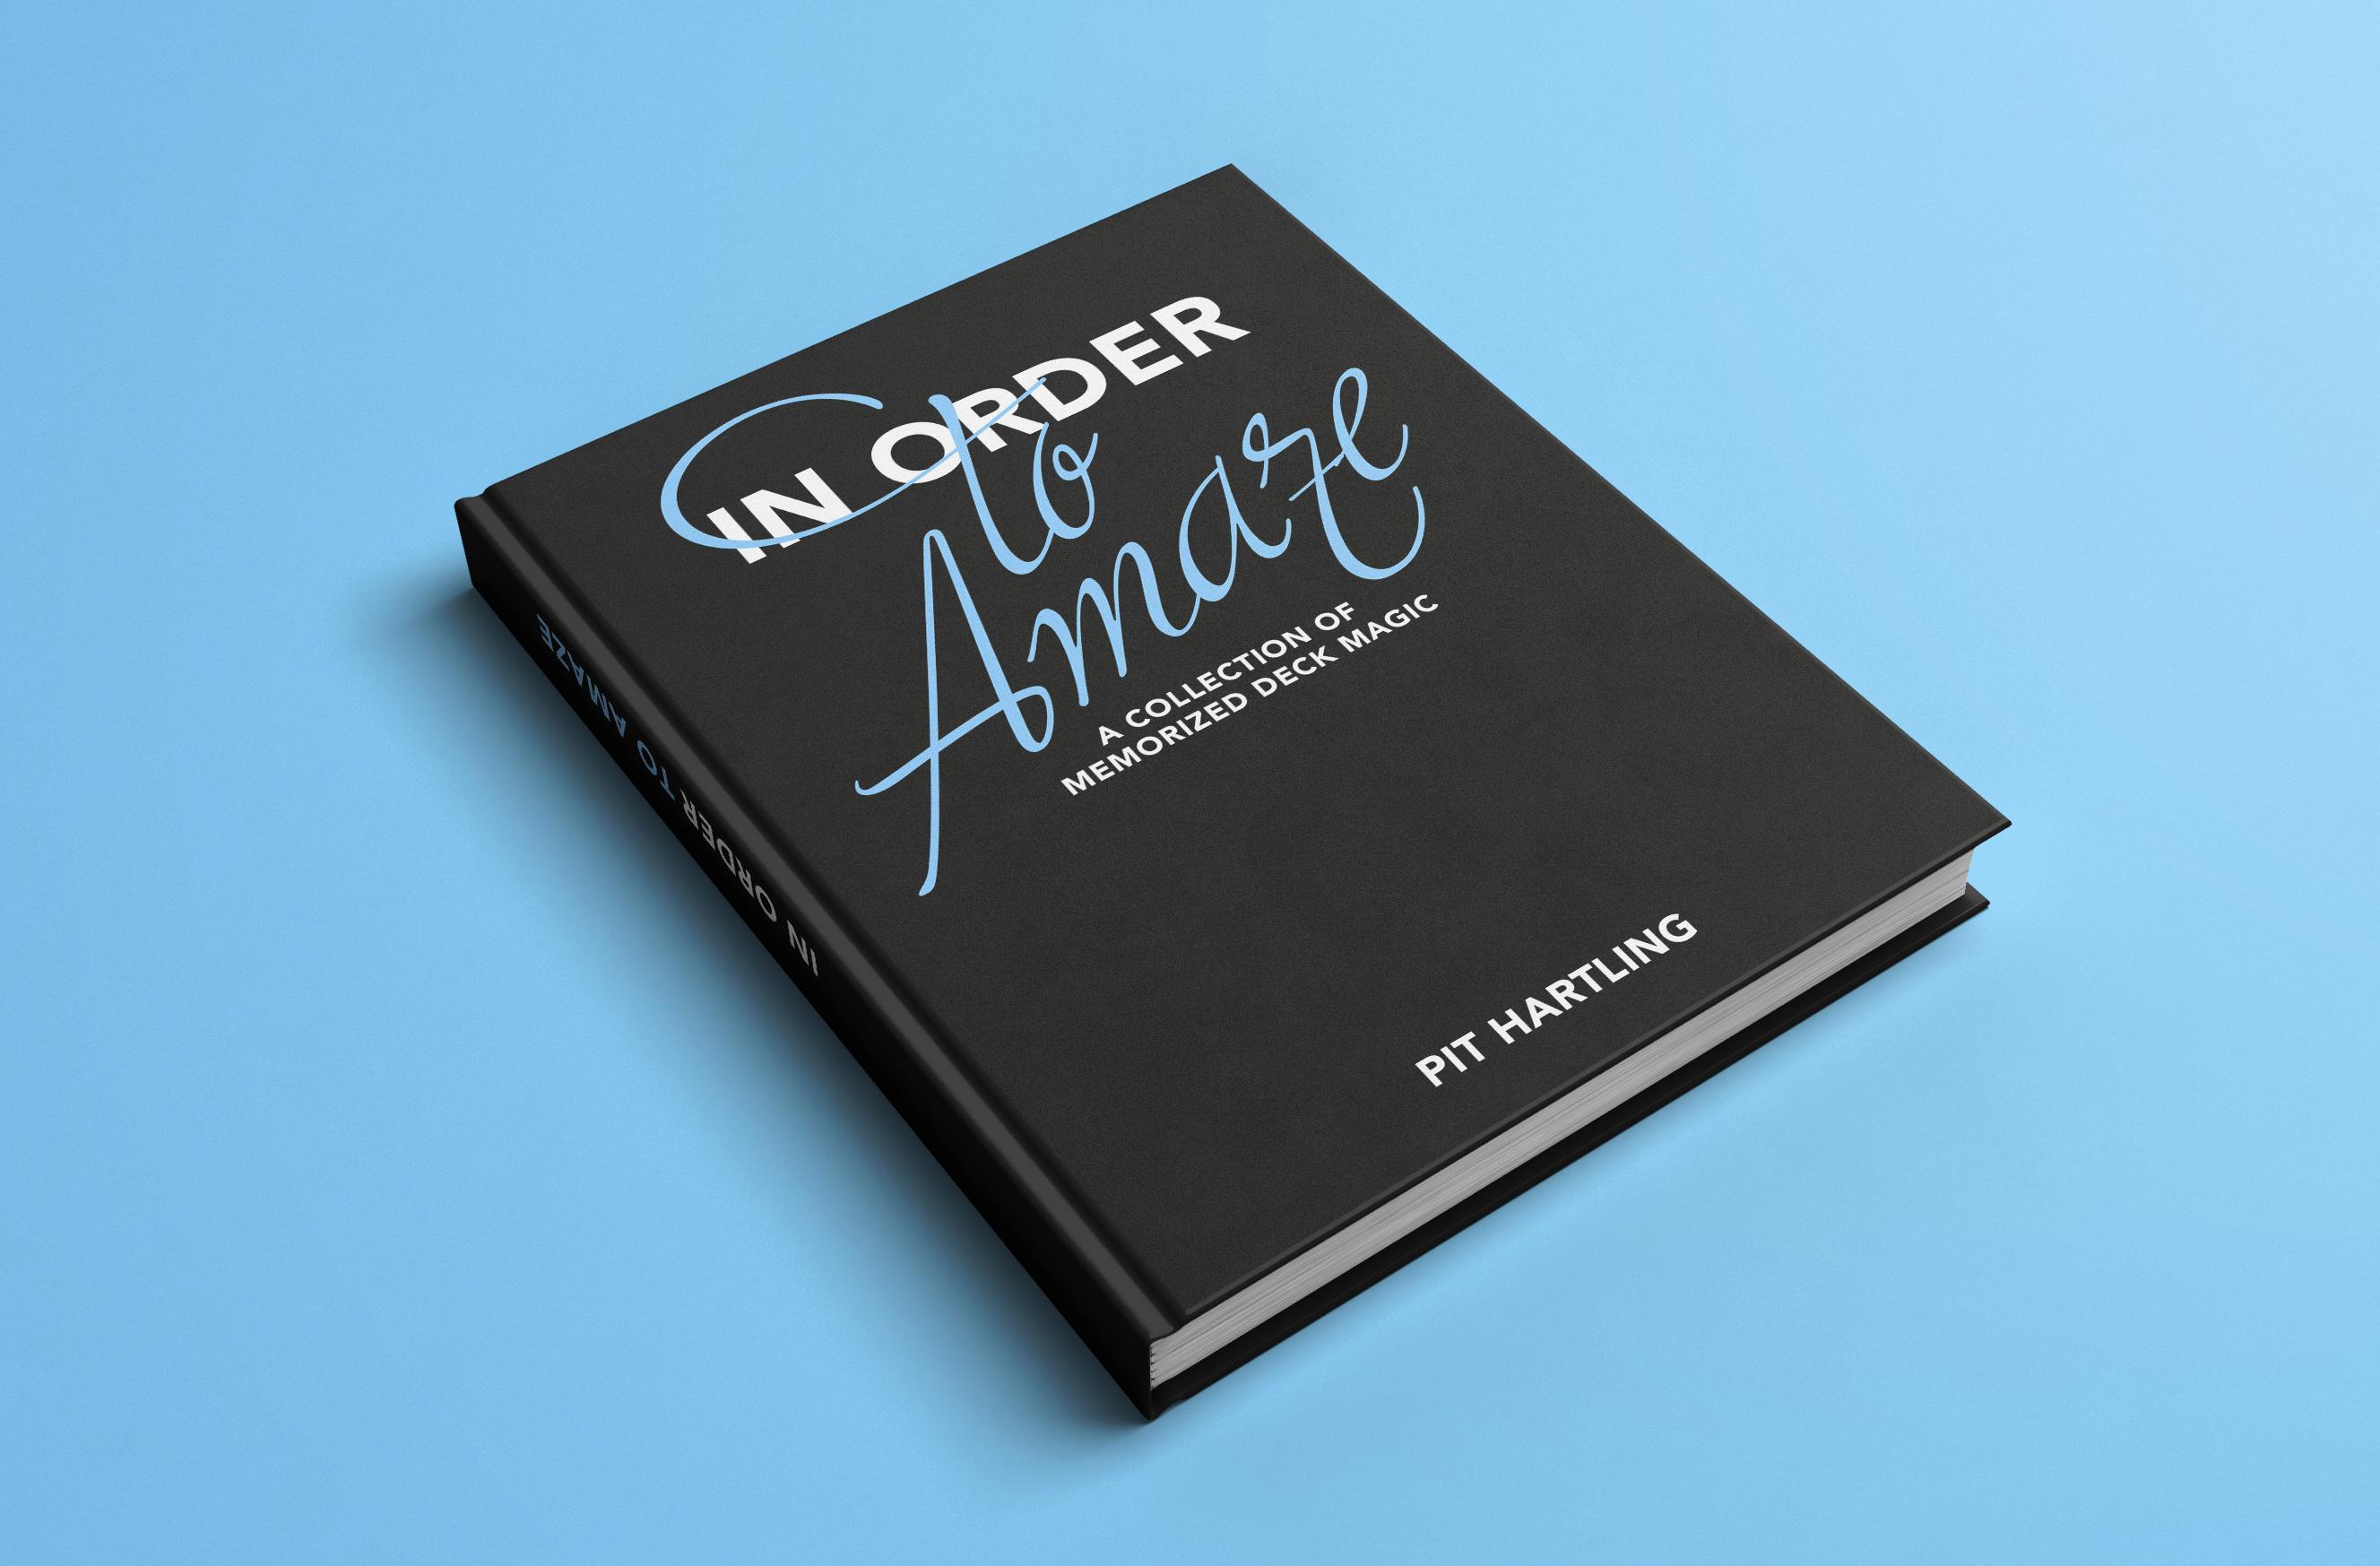 Pits neues Buch